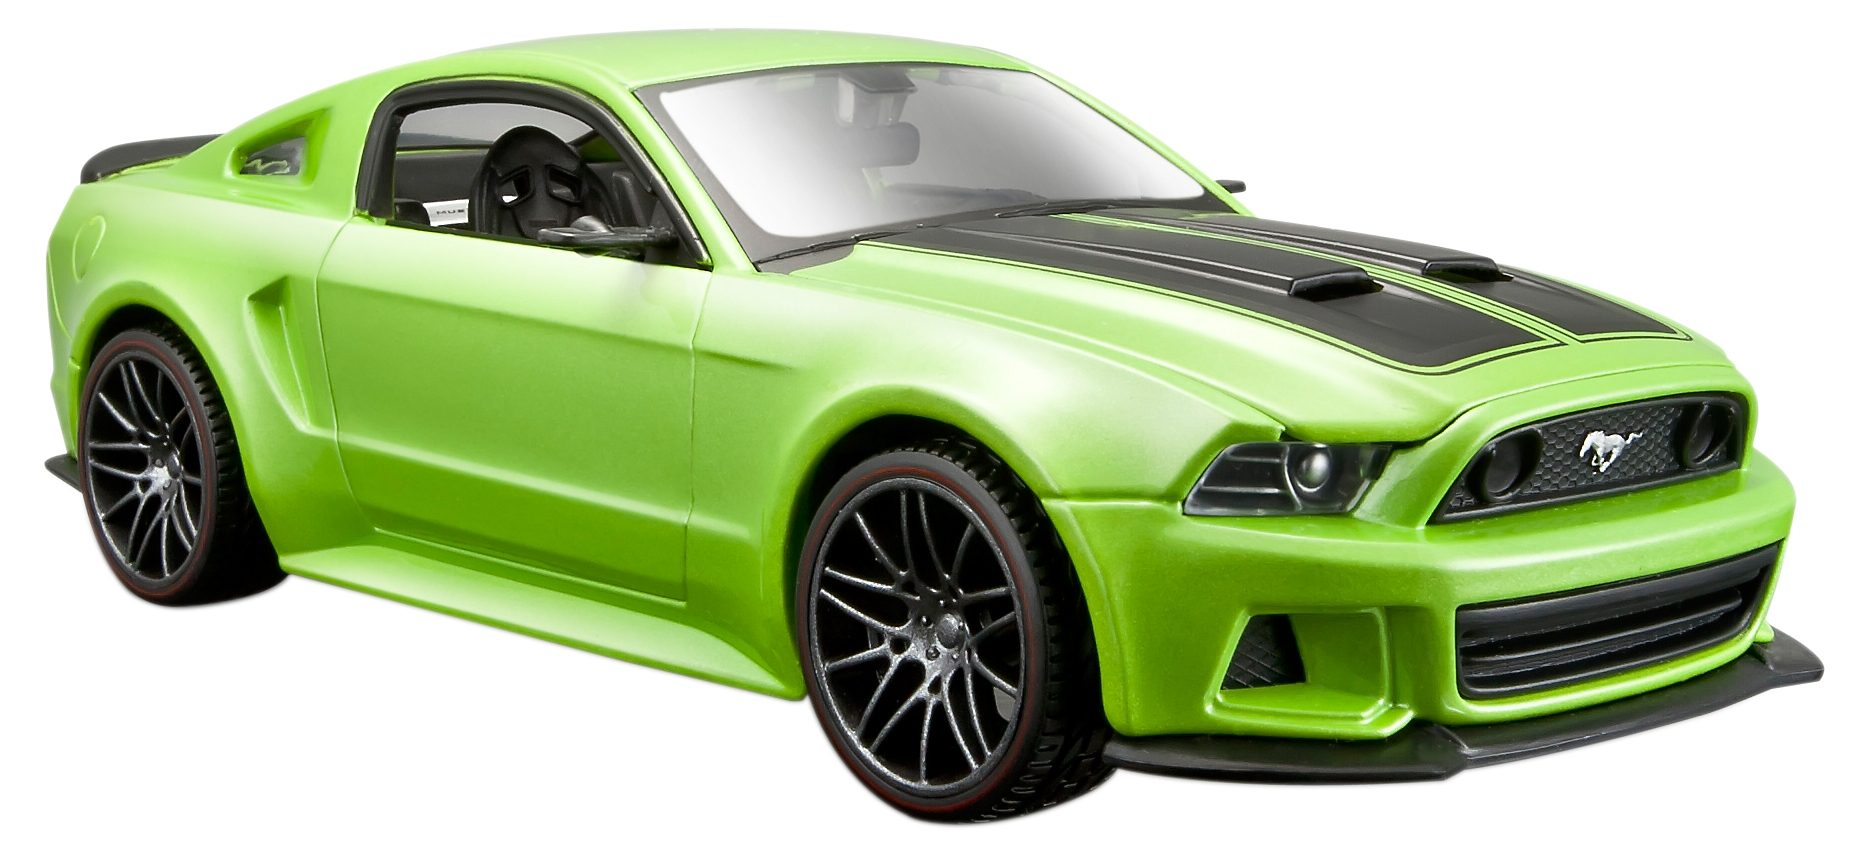 Maisto®, Sammlerauto, 1:24, »Ford Mustang Street Racer '14«